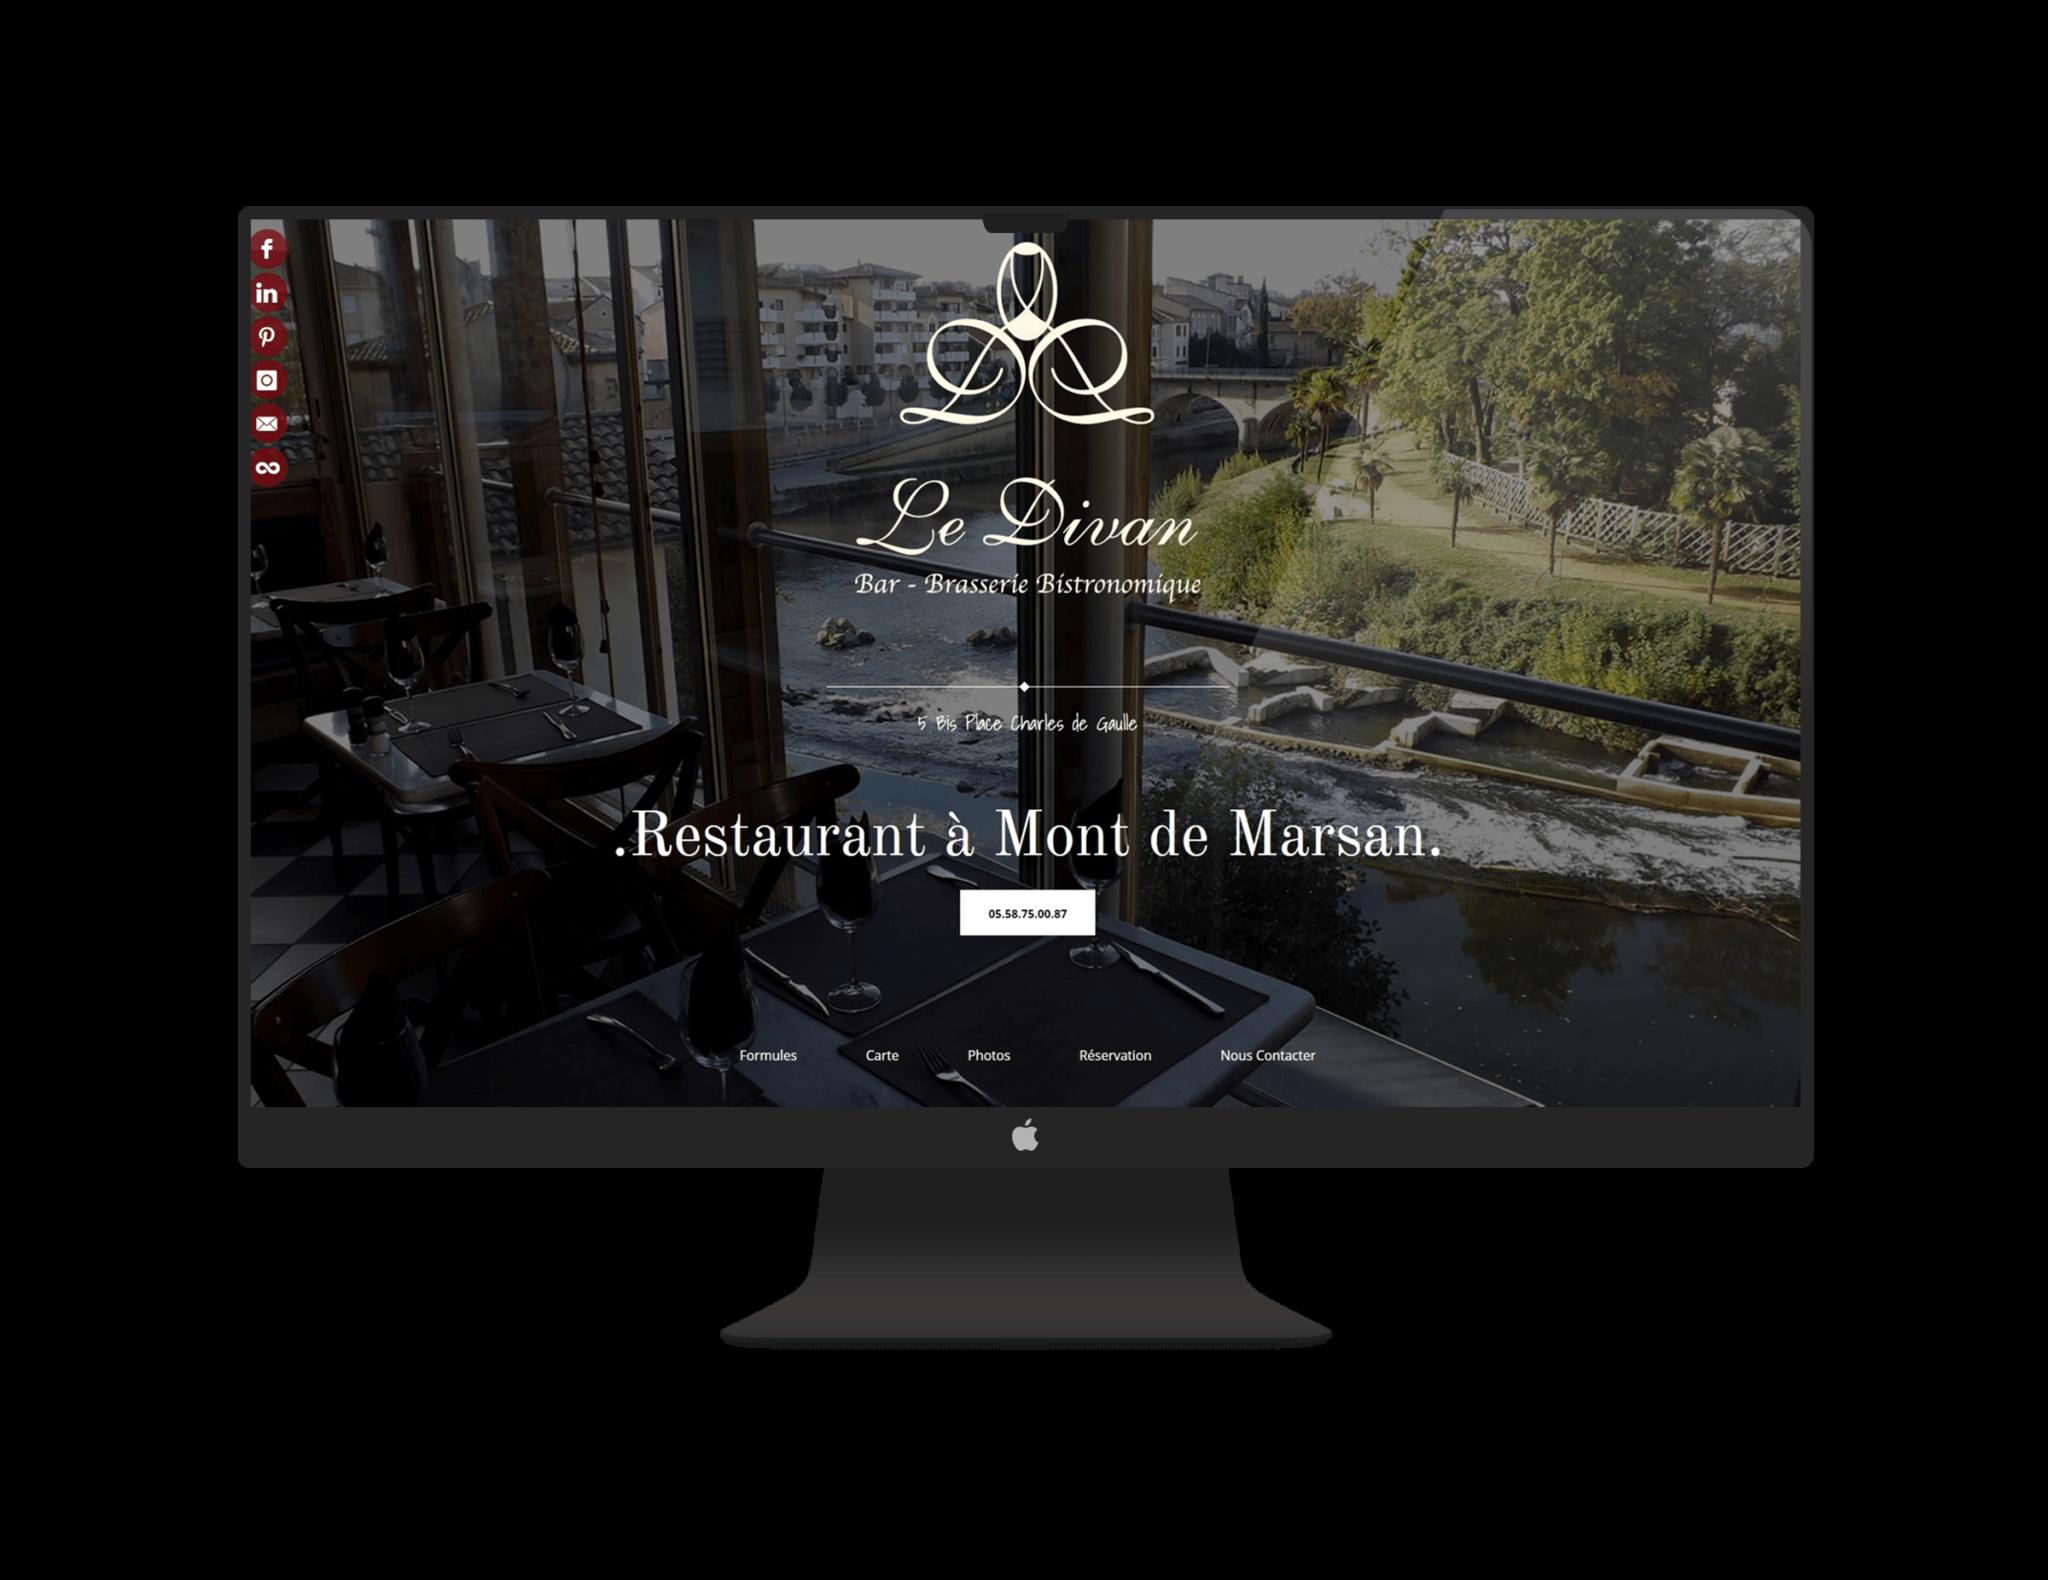 agence-creation-site-graphics-landes-aquitaine-mont-de-marsan-vitrine-restaurant-brasserie-dax-bayonne-capbreton-hossegor-biarritz